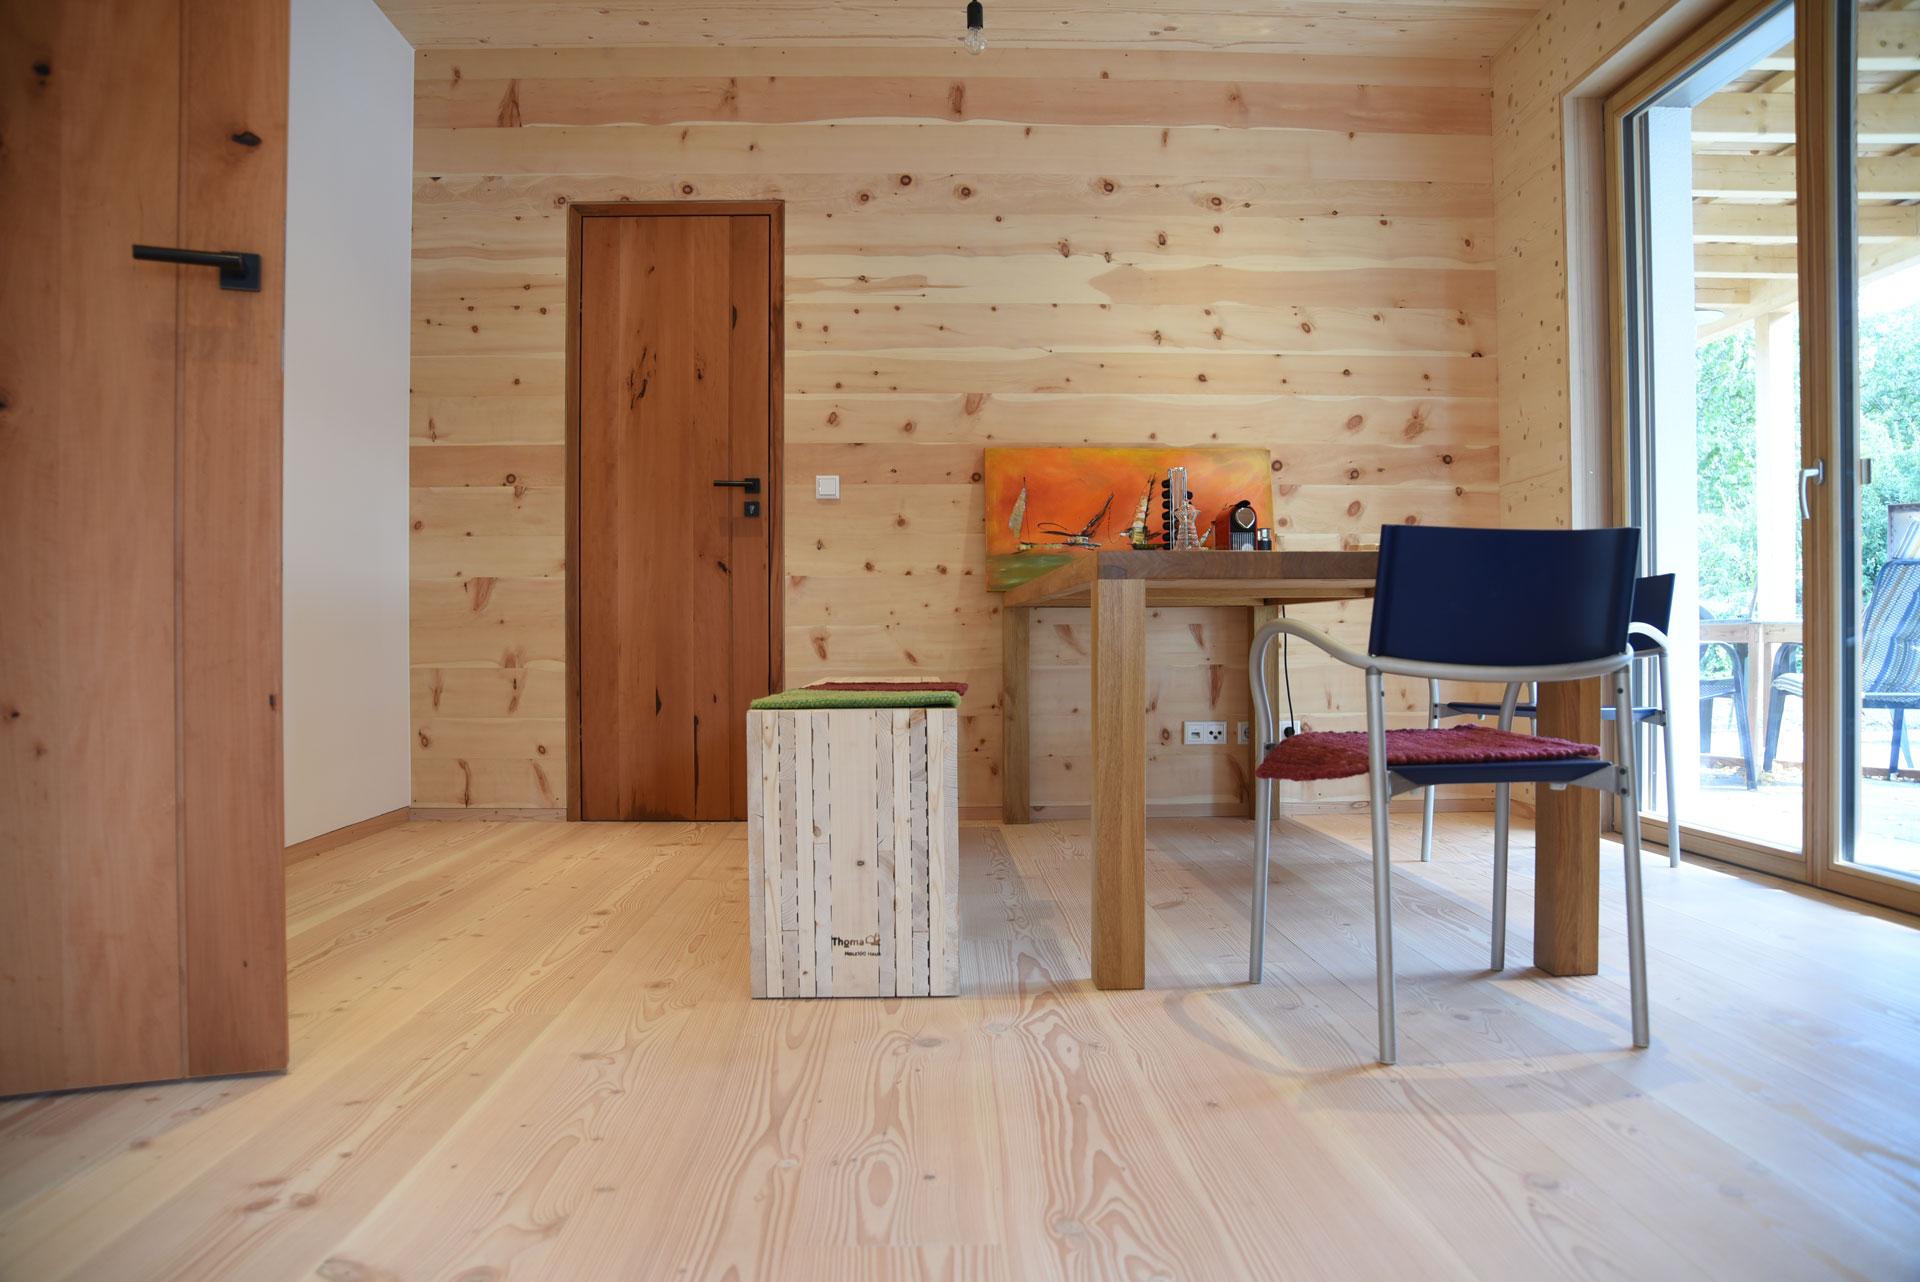 Arbeitsraum im Holz100 Haus